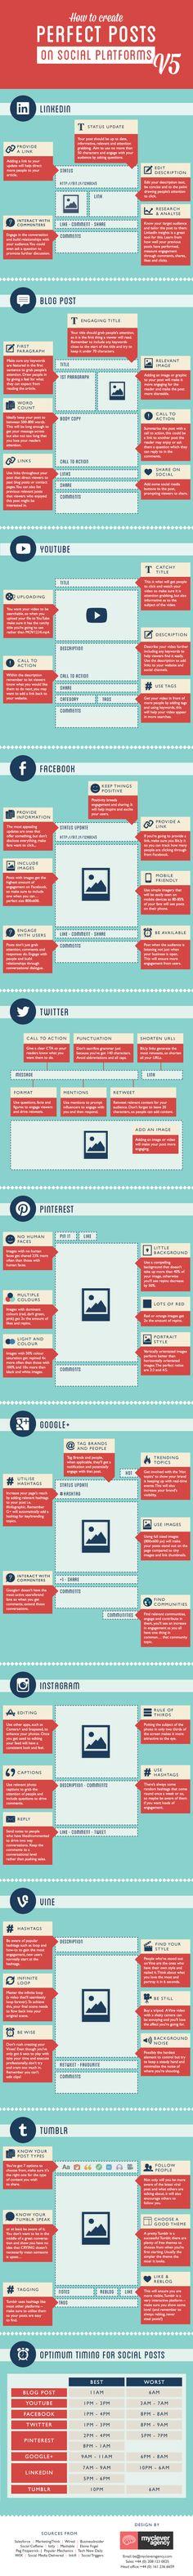 The Recipe for the Perfect Social Media Posts!   #socialmedia